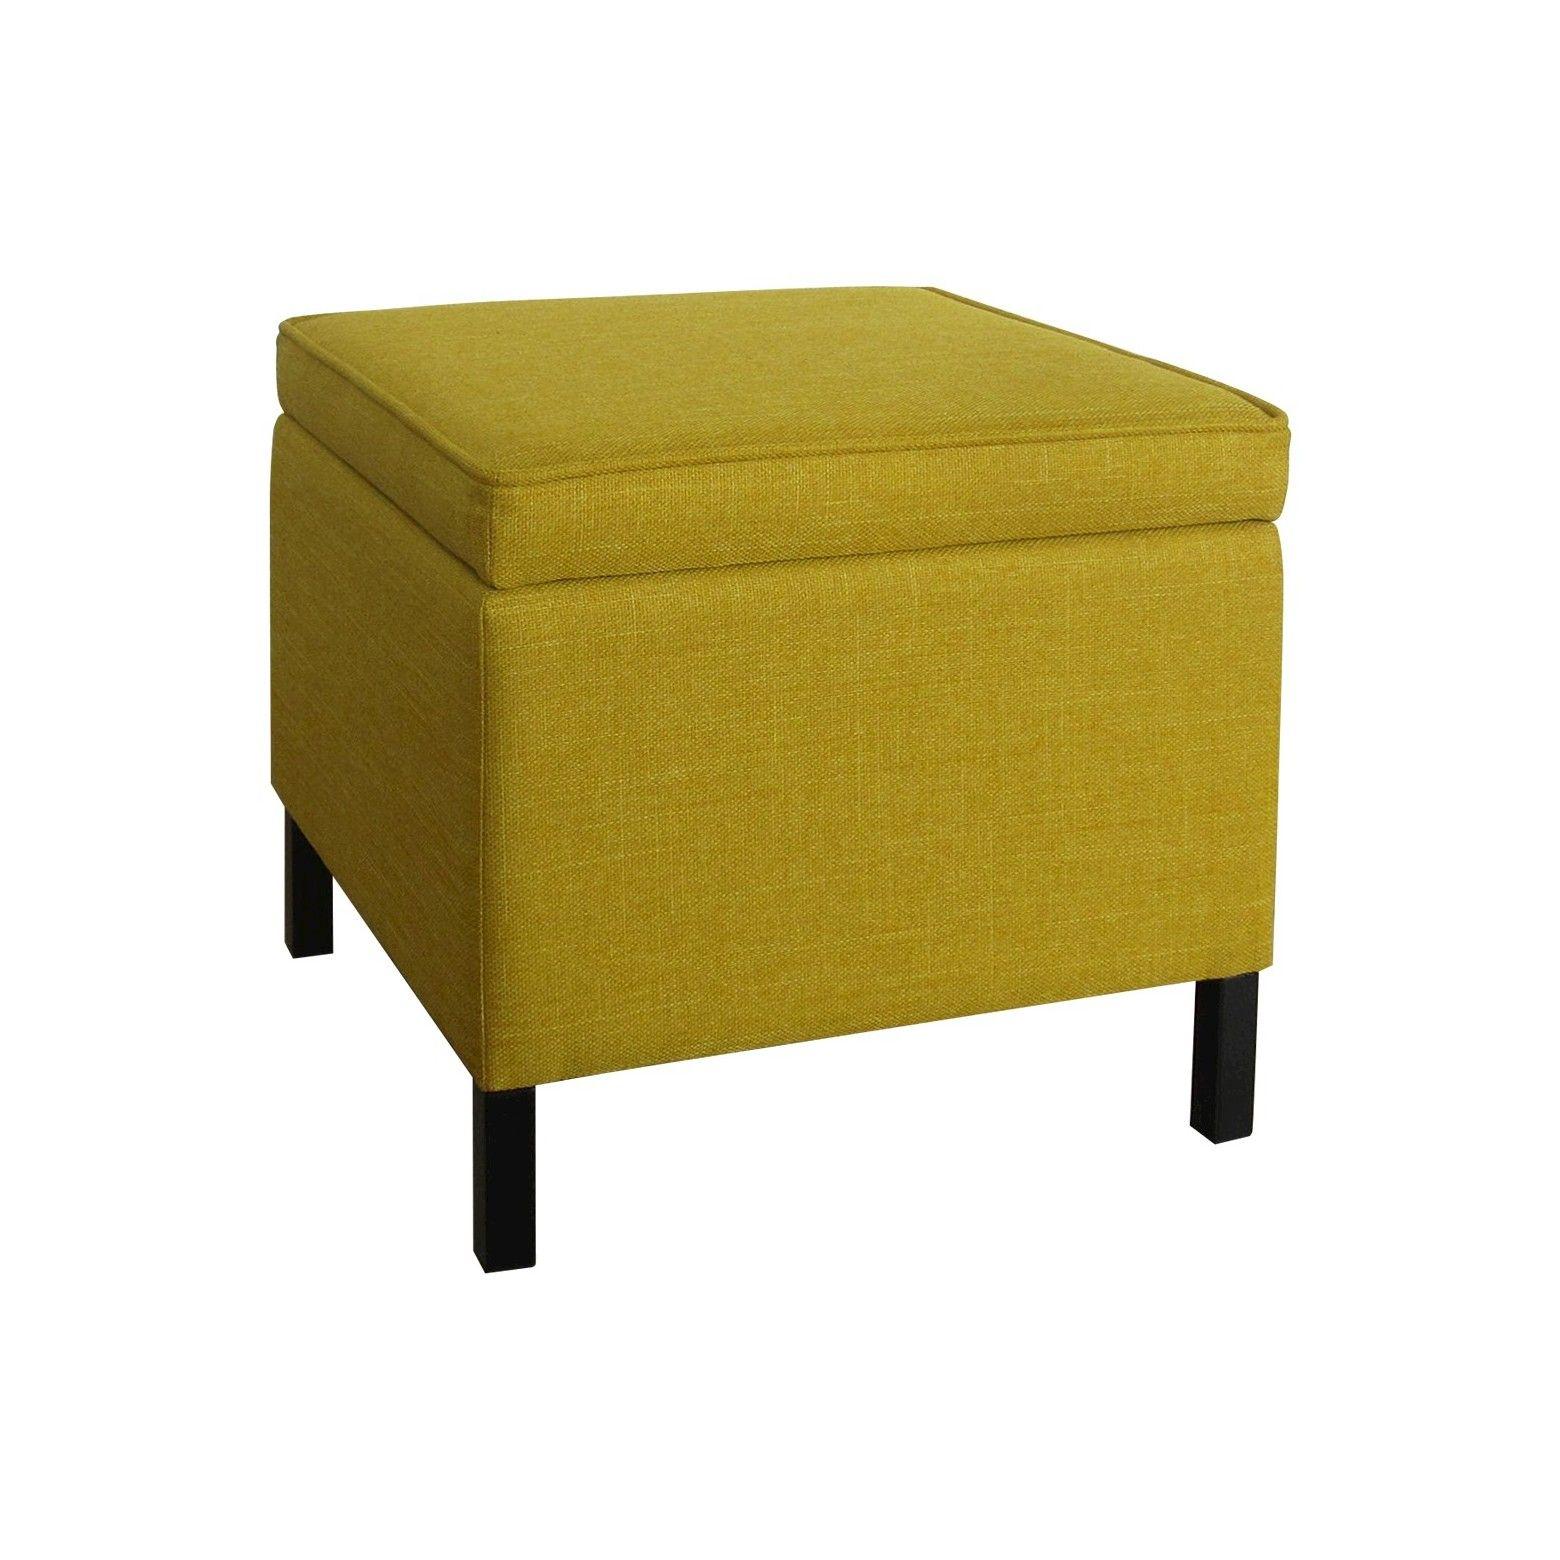 Storage Ottoman Yellow Room Essentials Yellow Storage Room